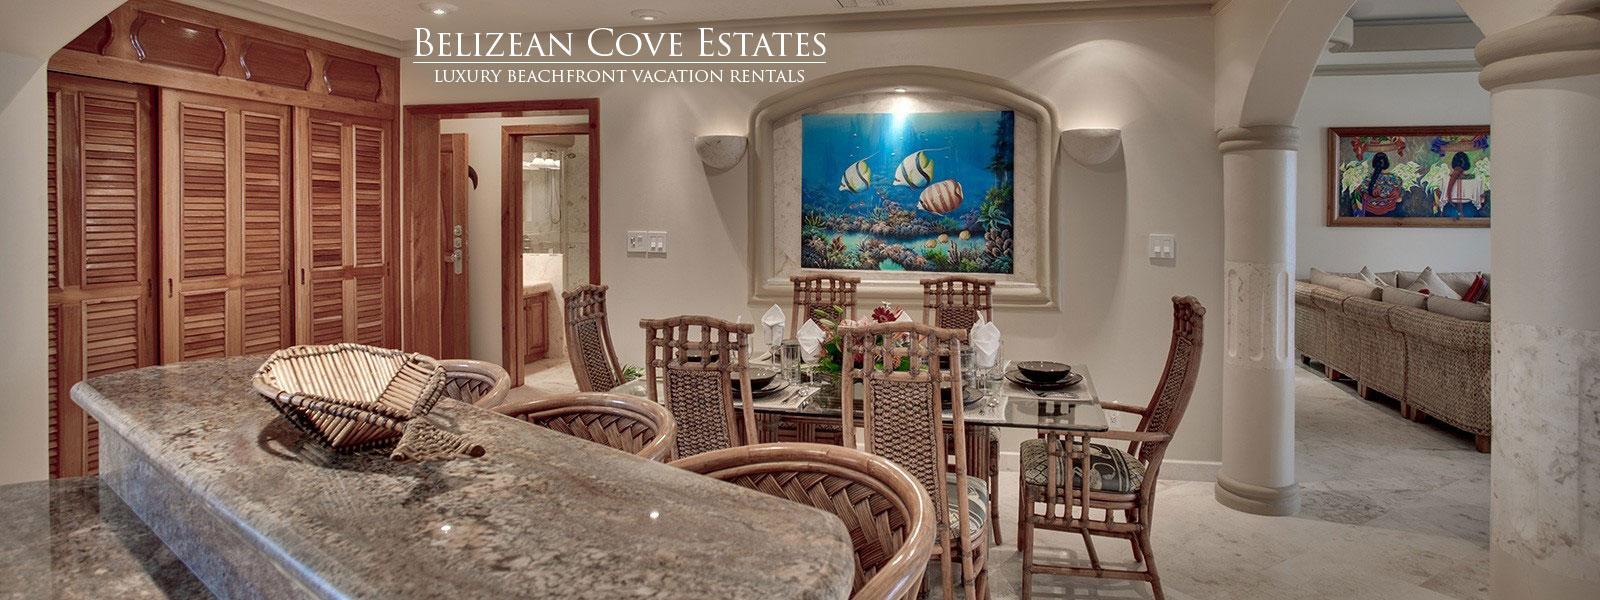 Luxury Vacation Rentals in Belize at Belizean Cove Estates